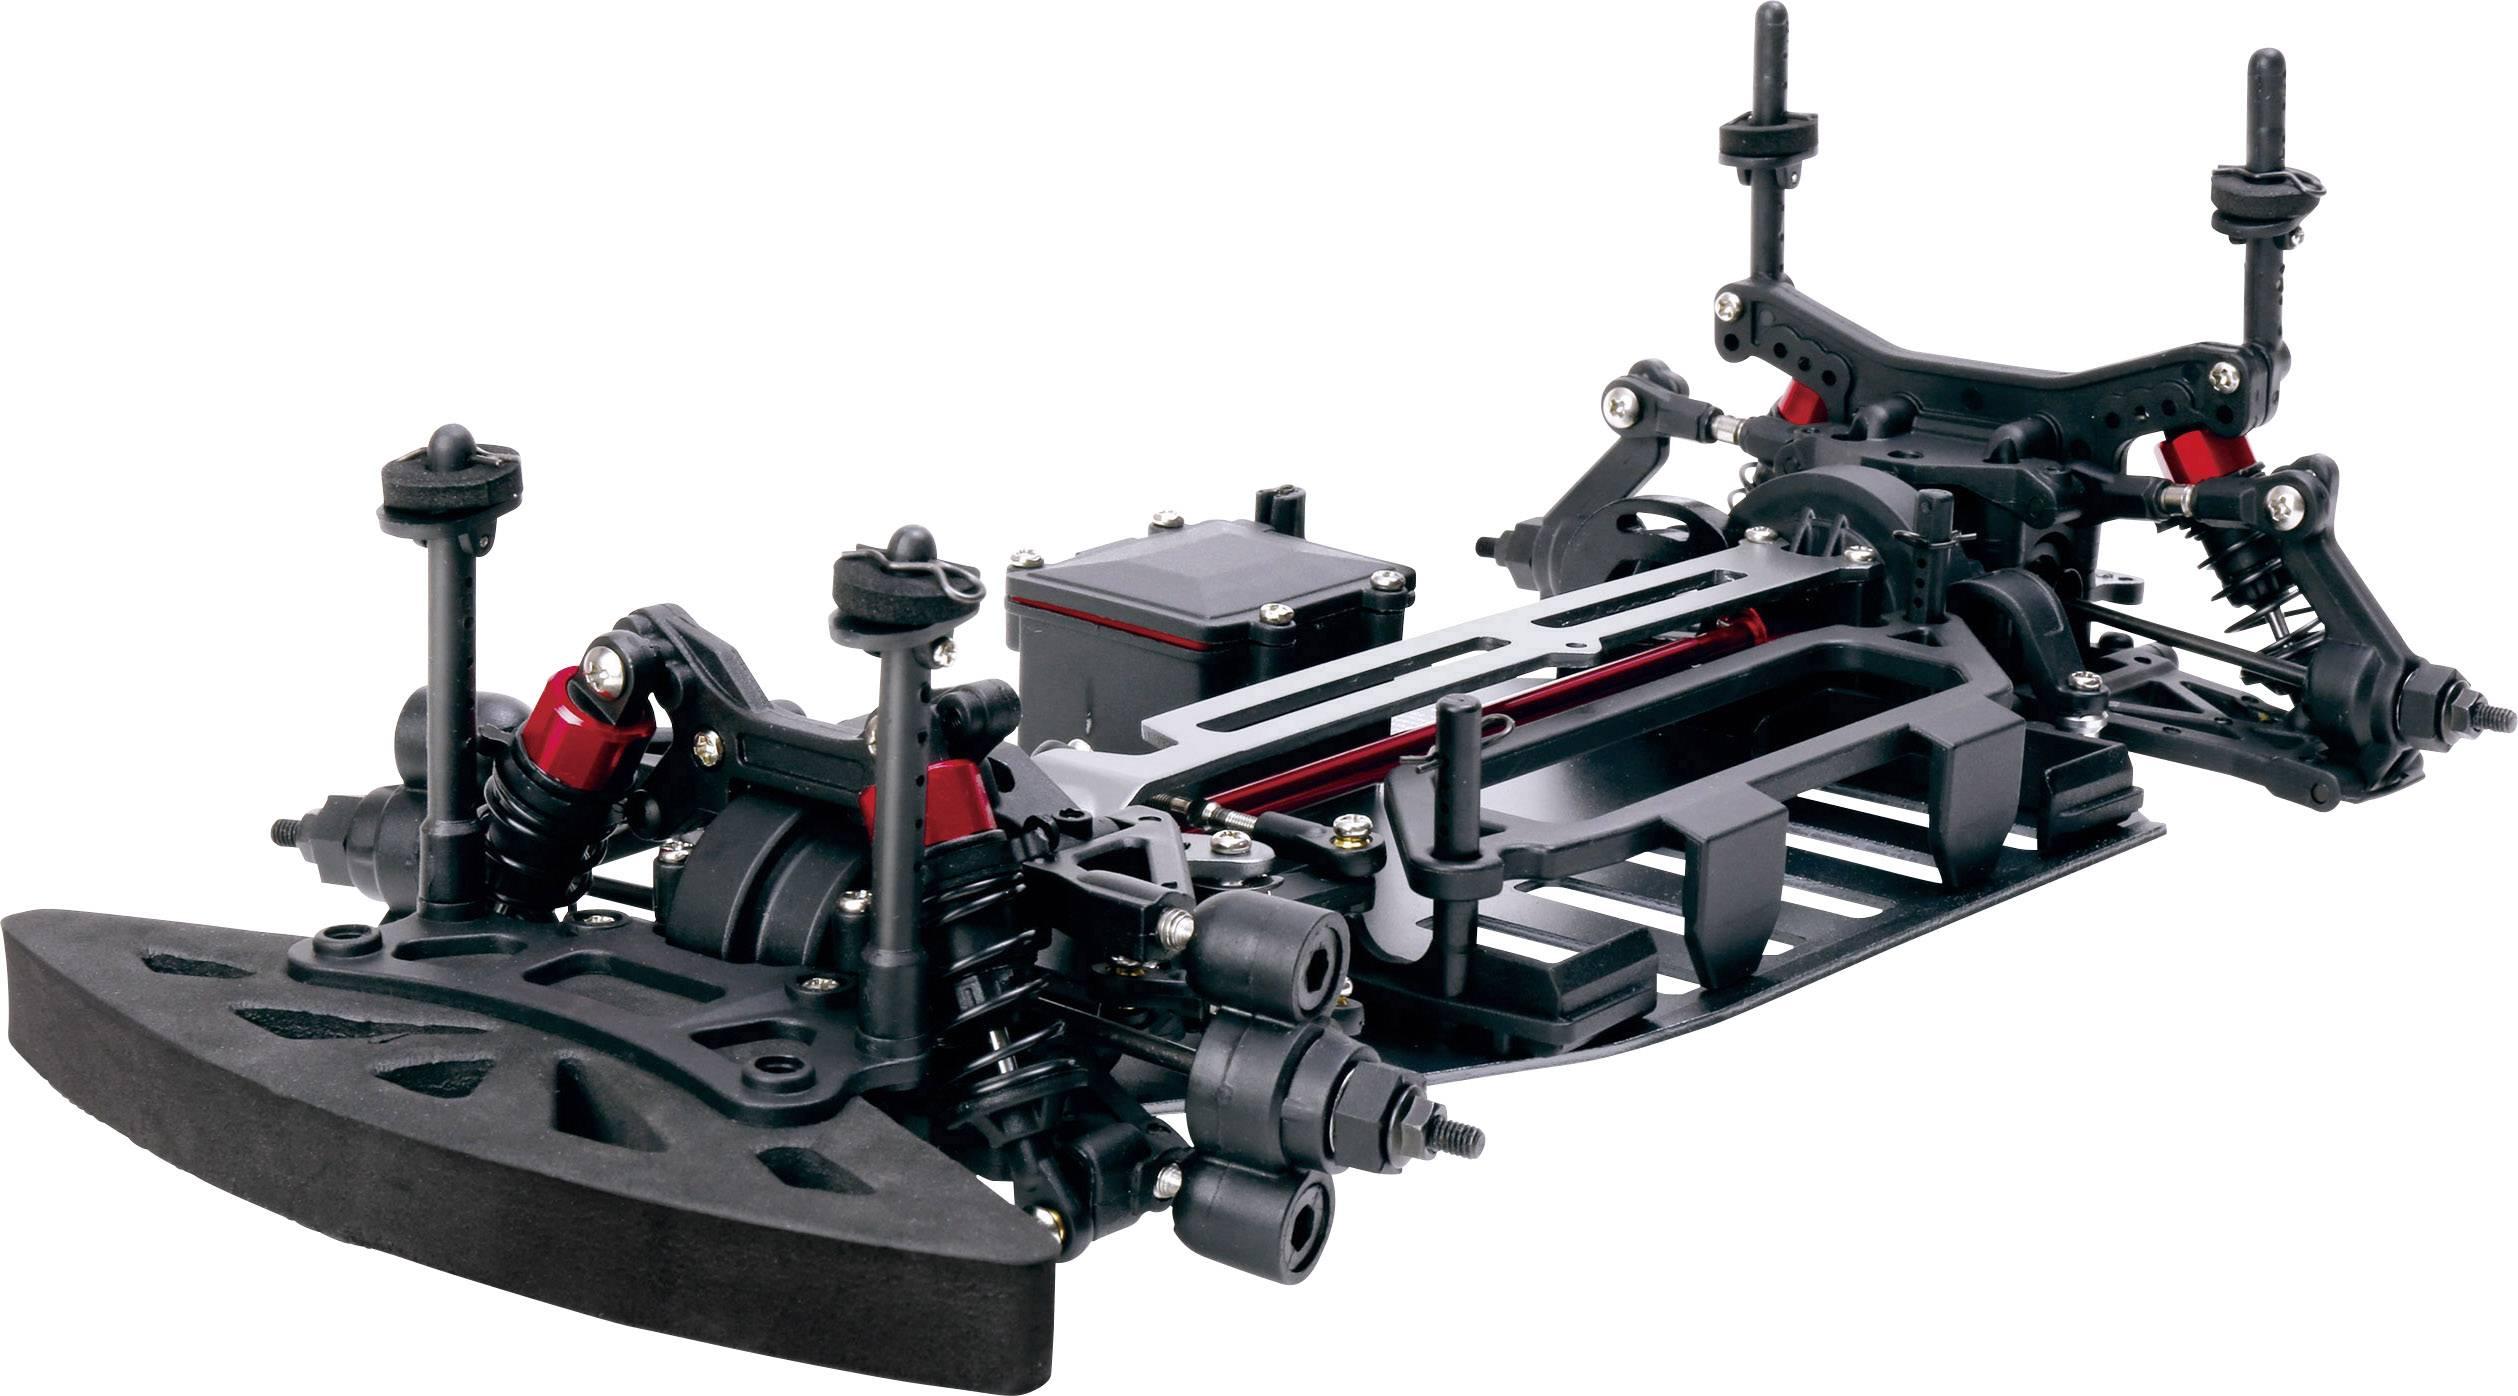 Šasi pro RC model auta ARR Reely Onroad-Chassis, 1:10, elektrický, 4WD (4x4)